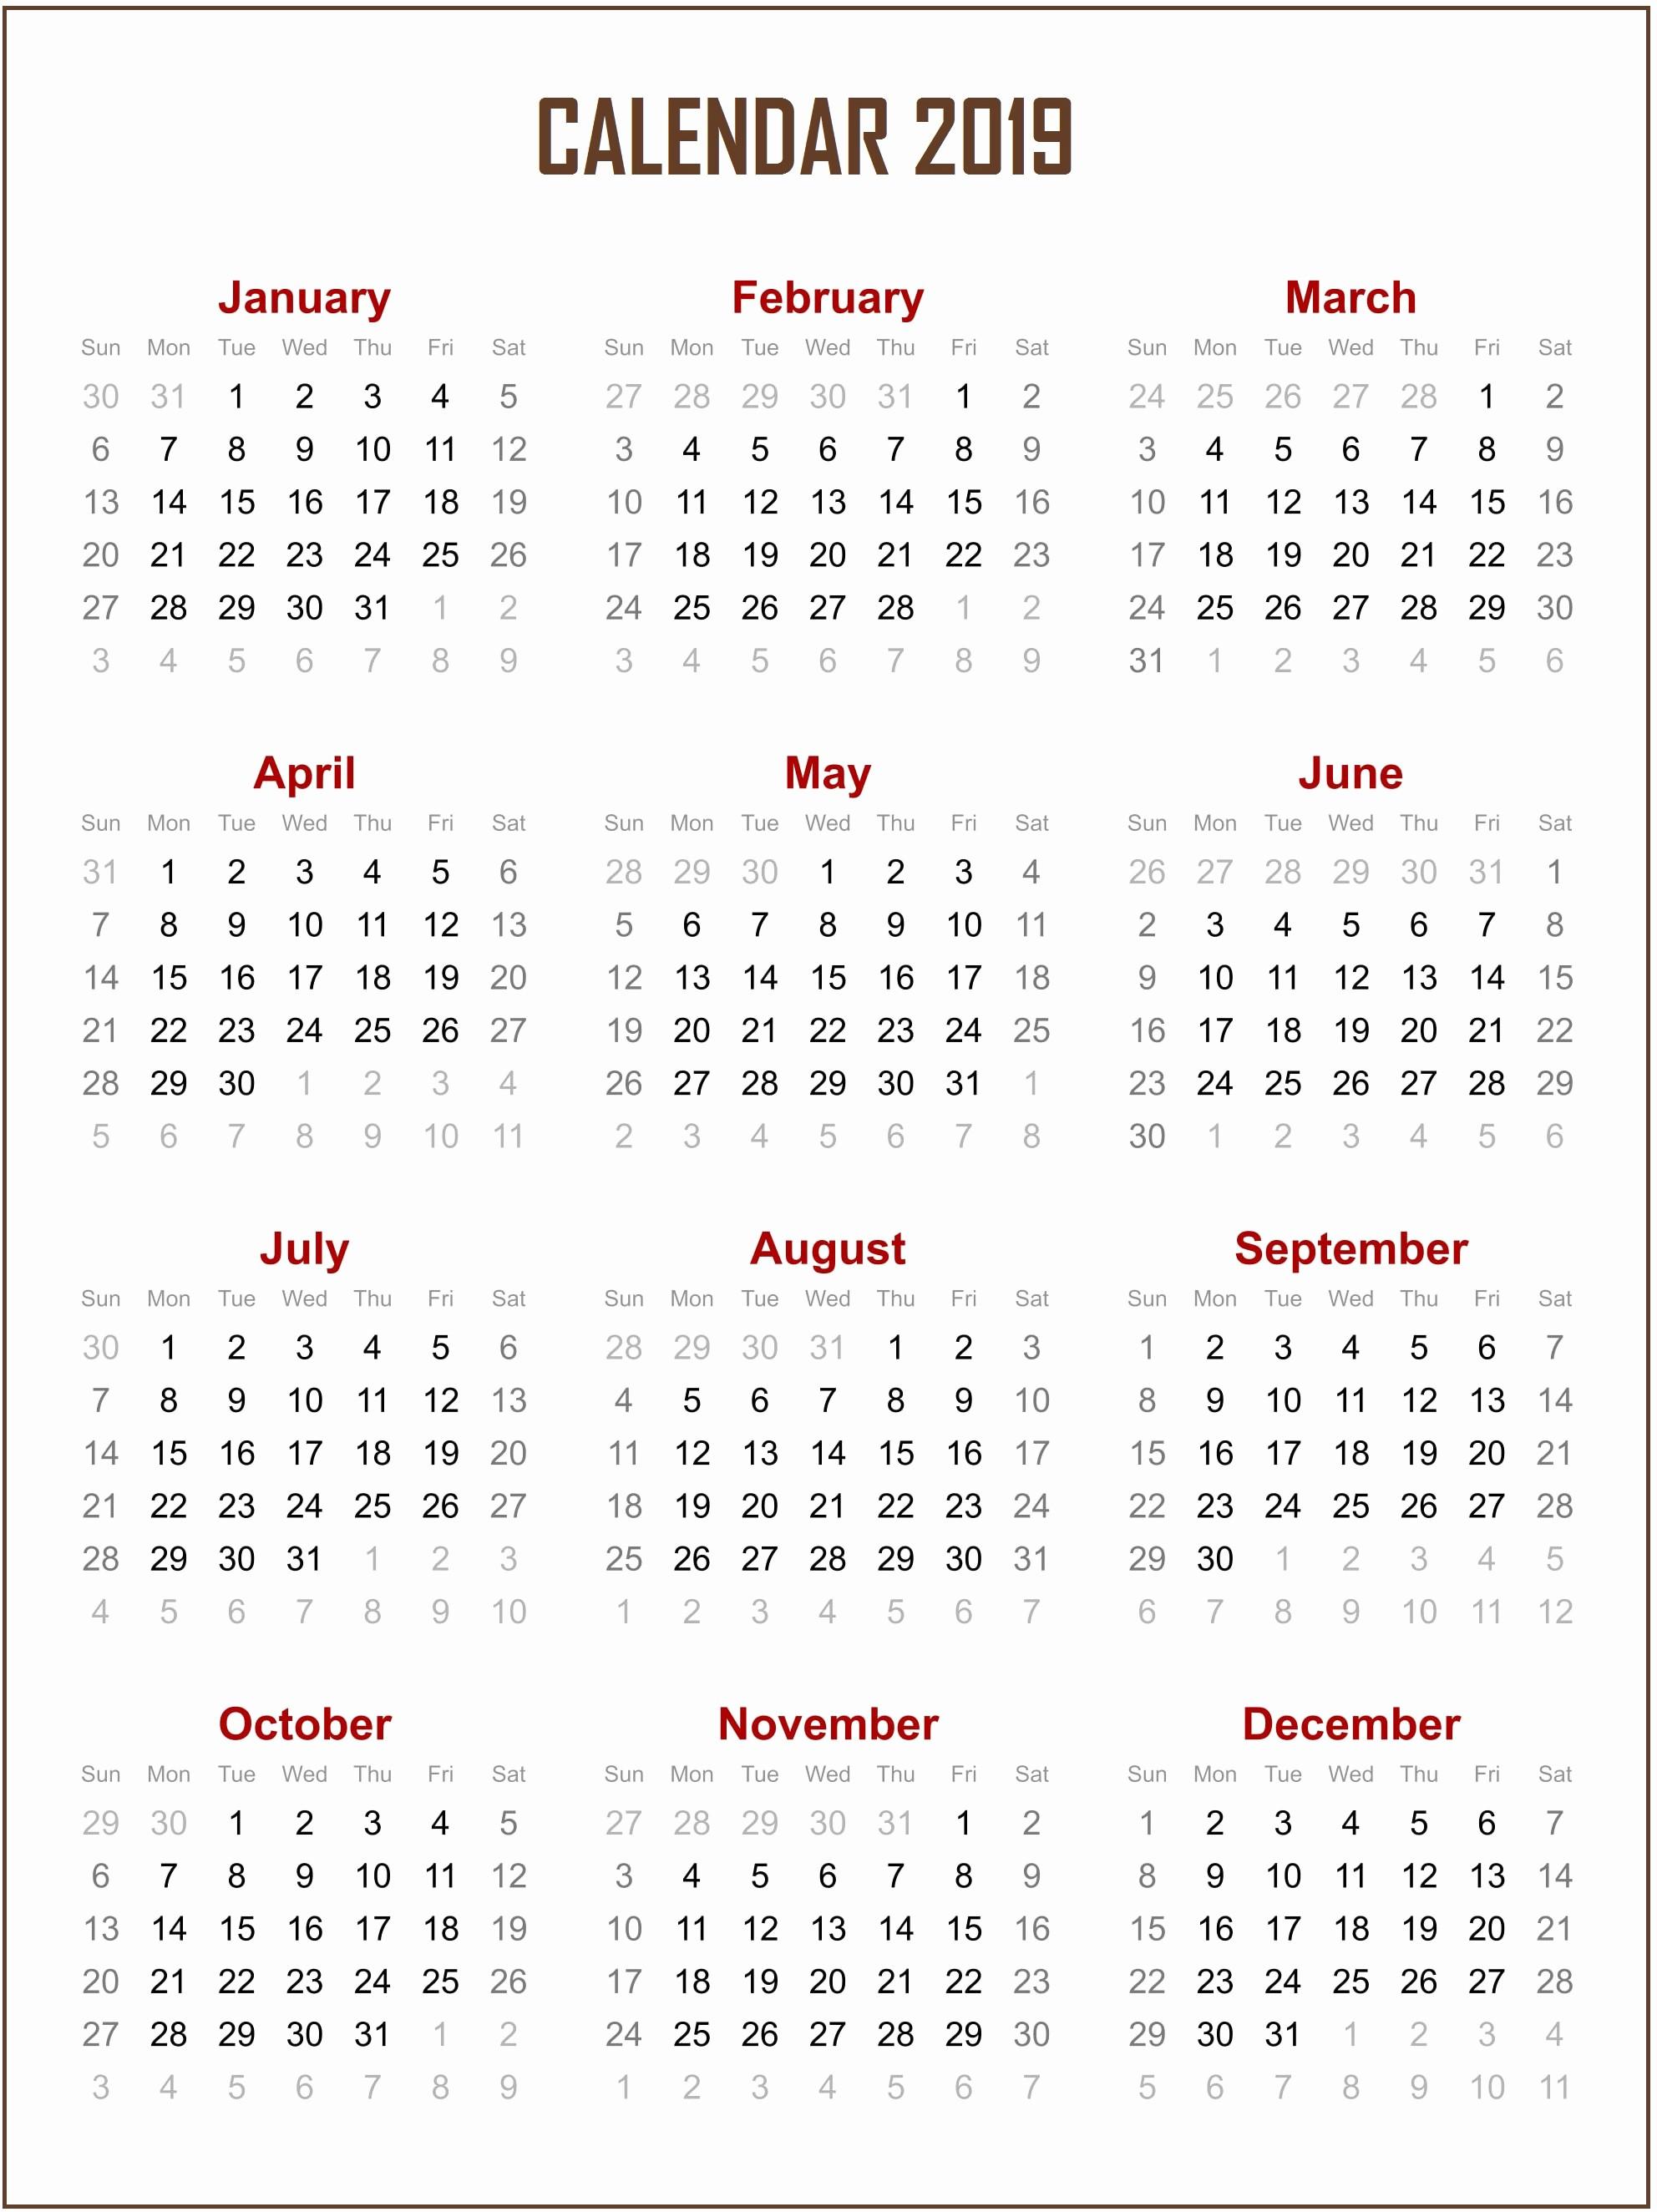 Free Printable Calendar Templates 2019 Lovely Free Printable 2019 Calendar Template – Free Calendar